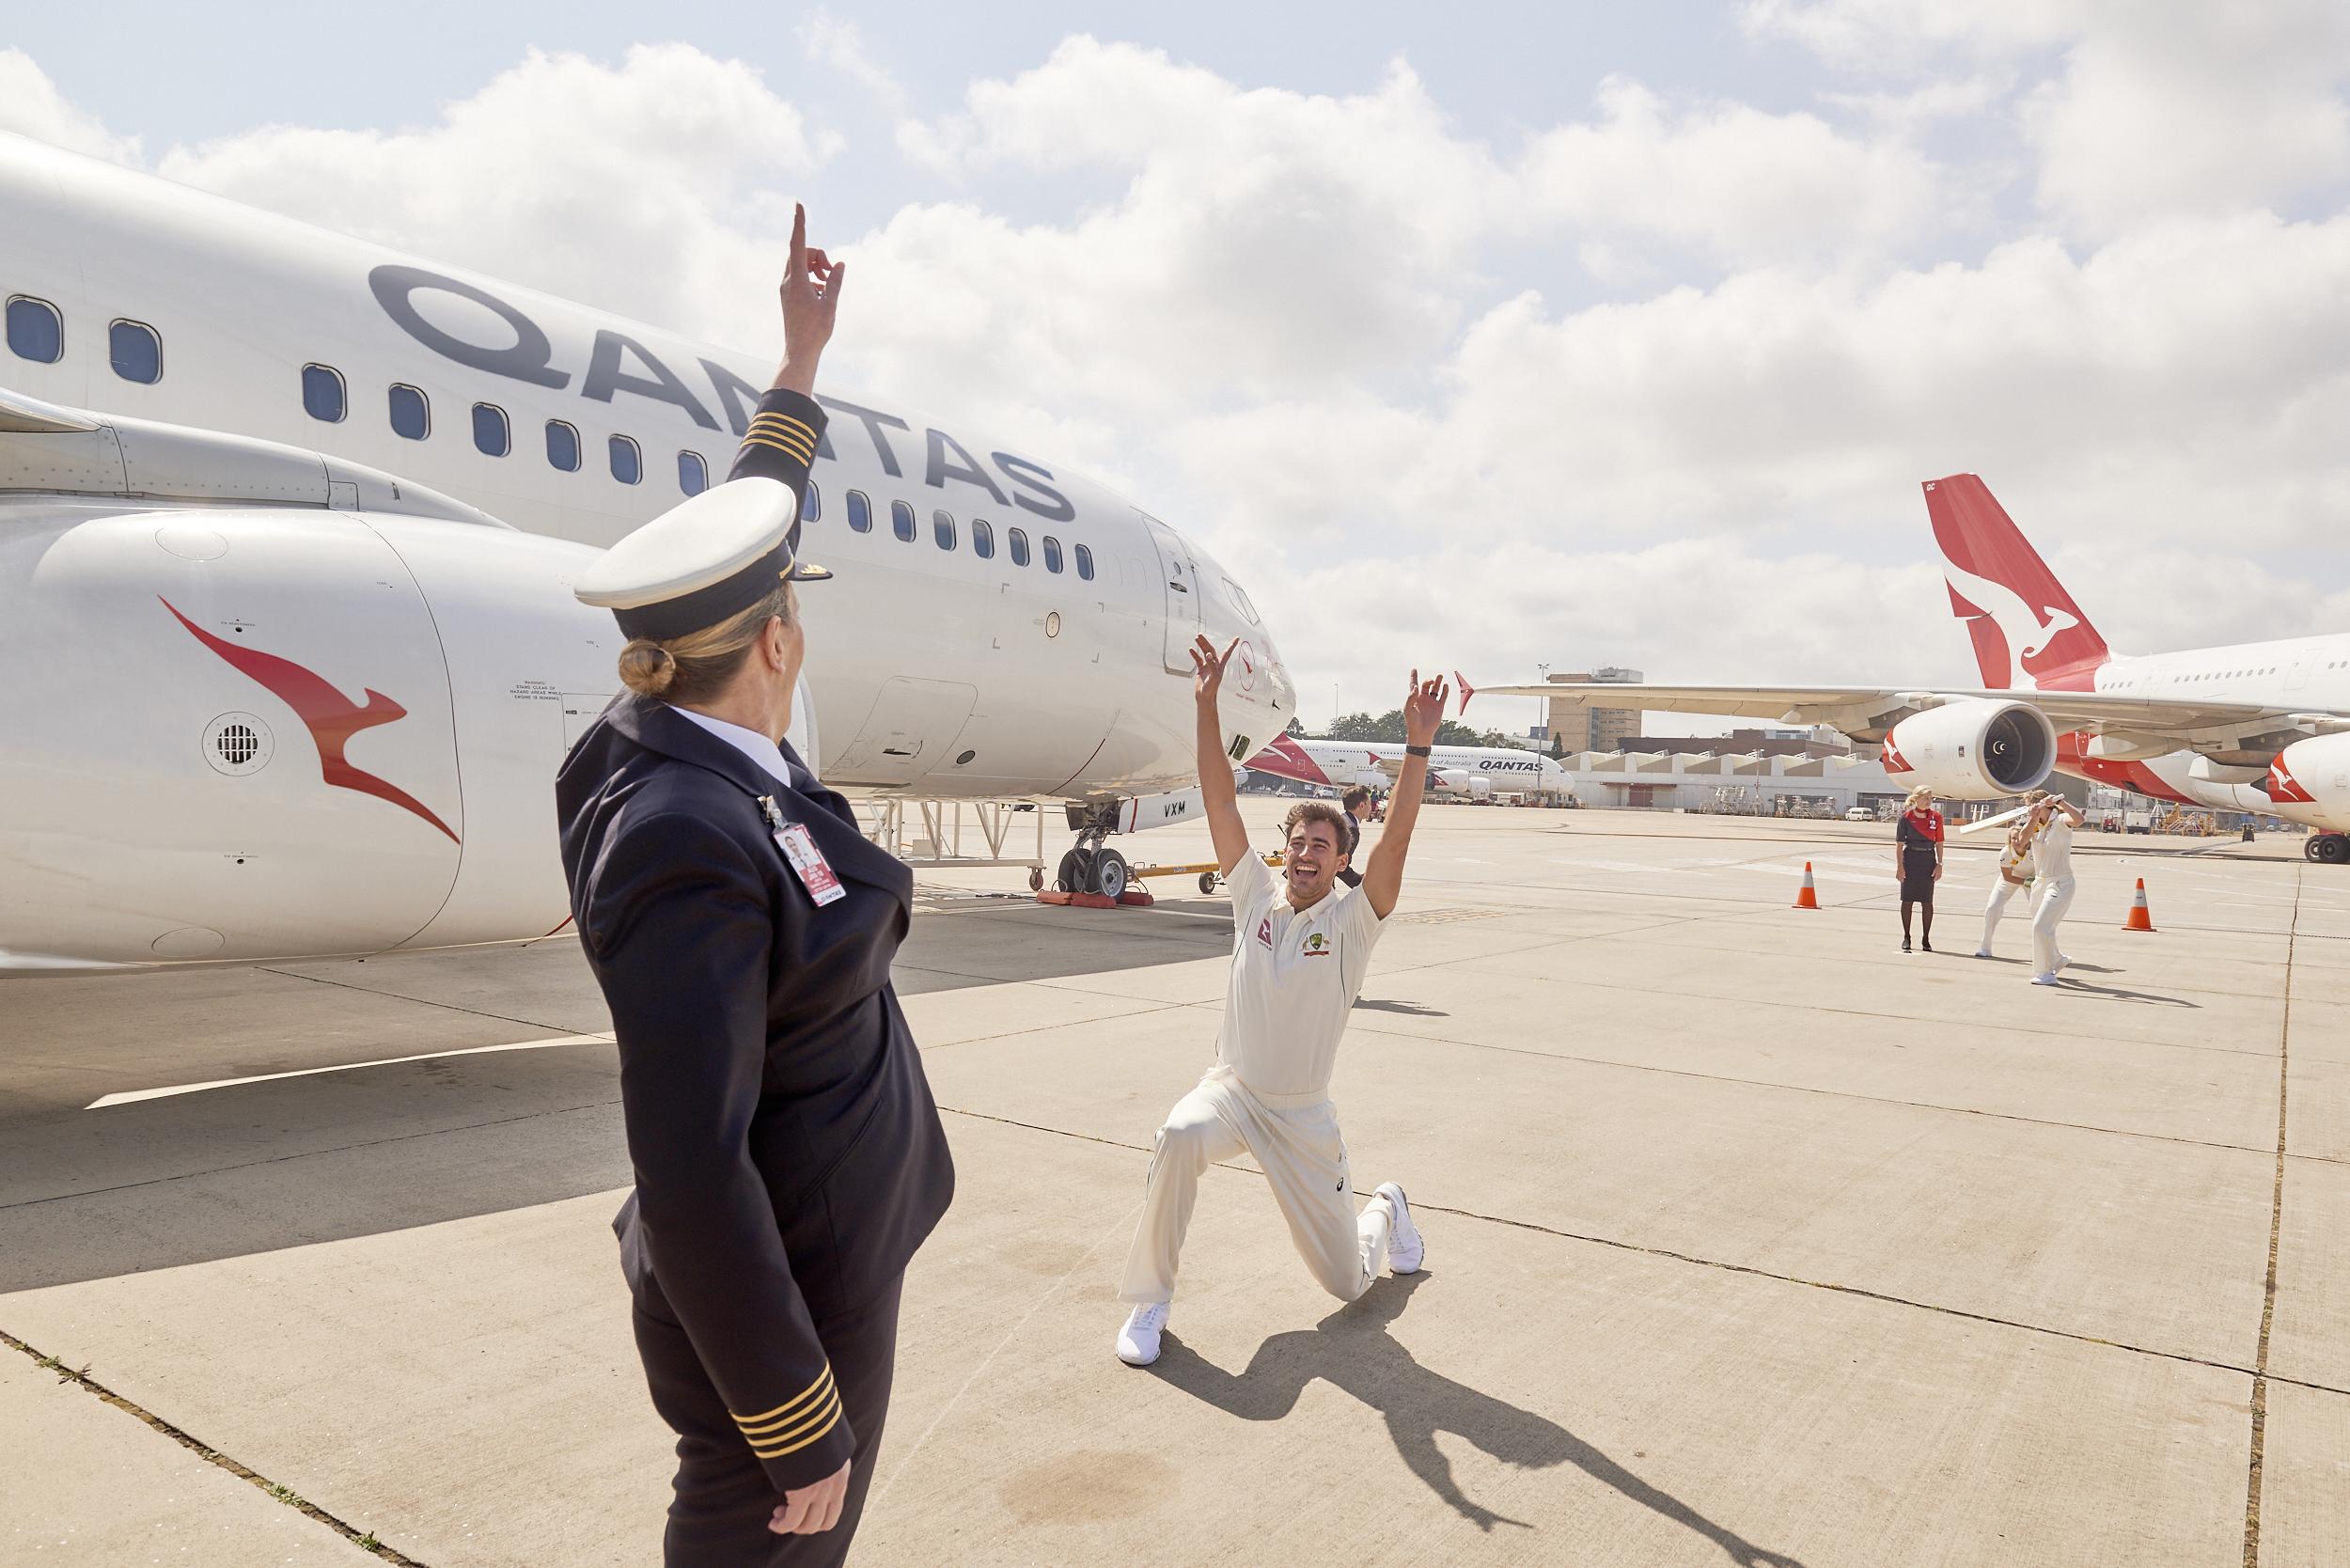 Stream the Cricket this summer from 30,000 feet using Qantas